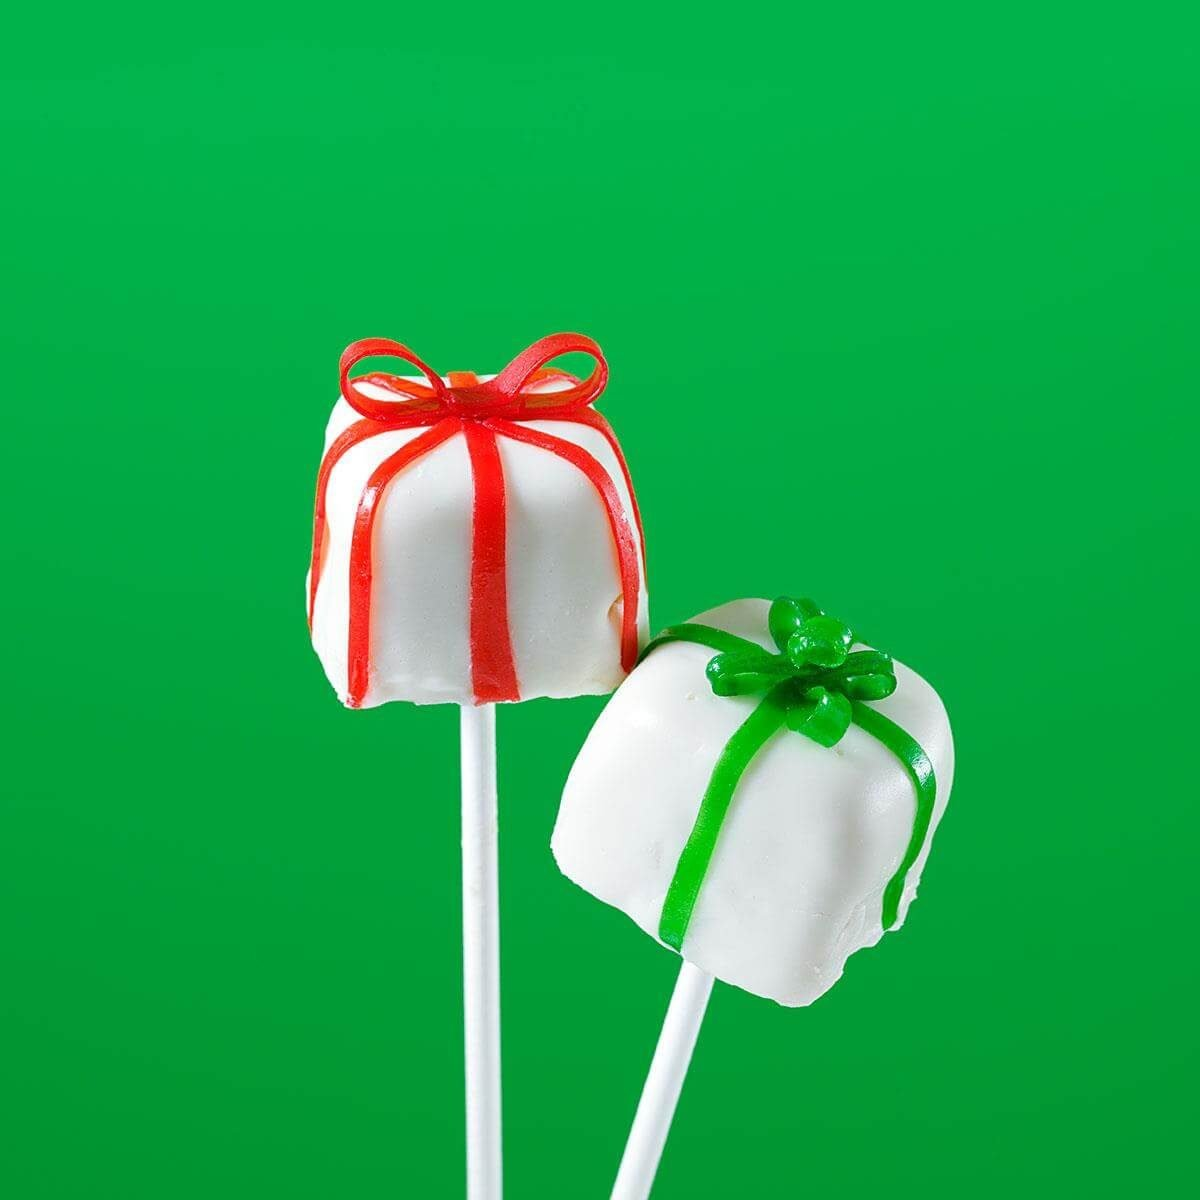 Cake Pops From Regular Cake Mix